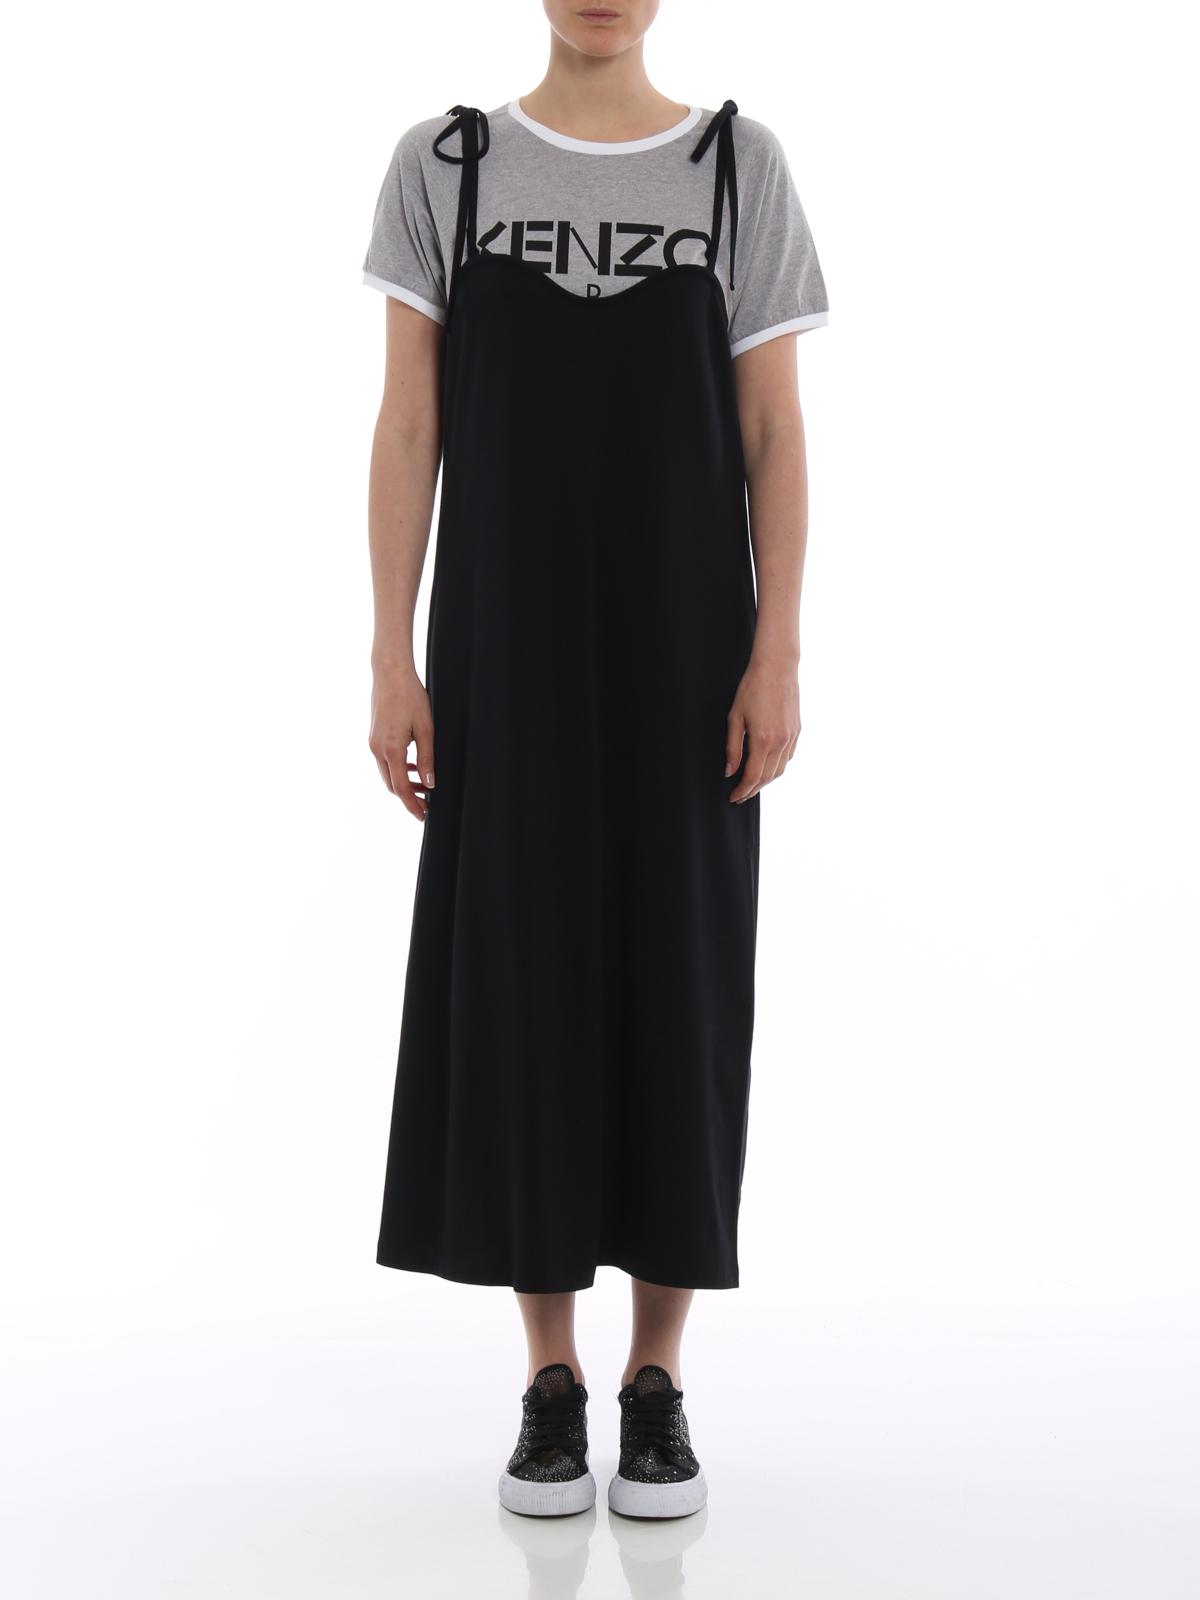 Kenzo Cotton Jersey T Shirt Dress Knee Length Dresses